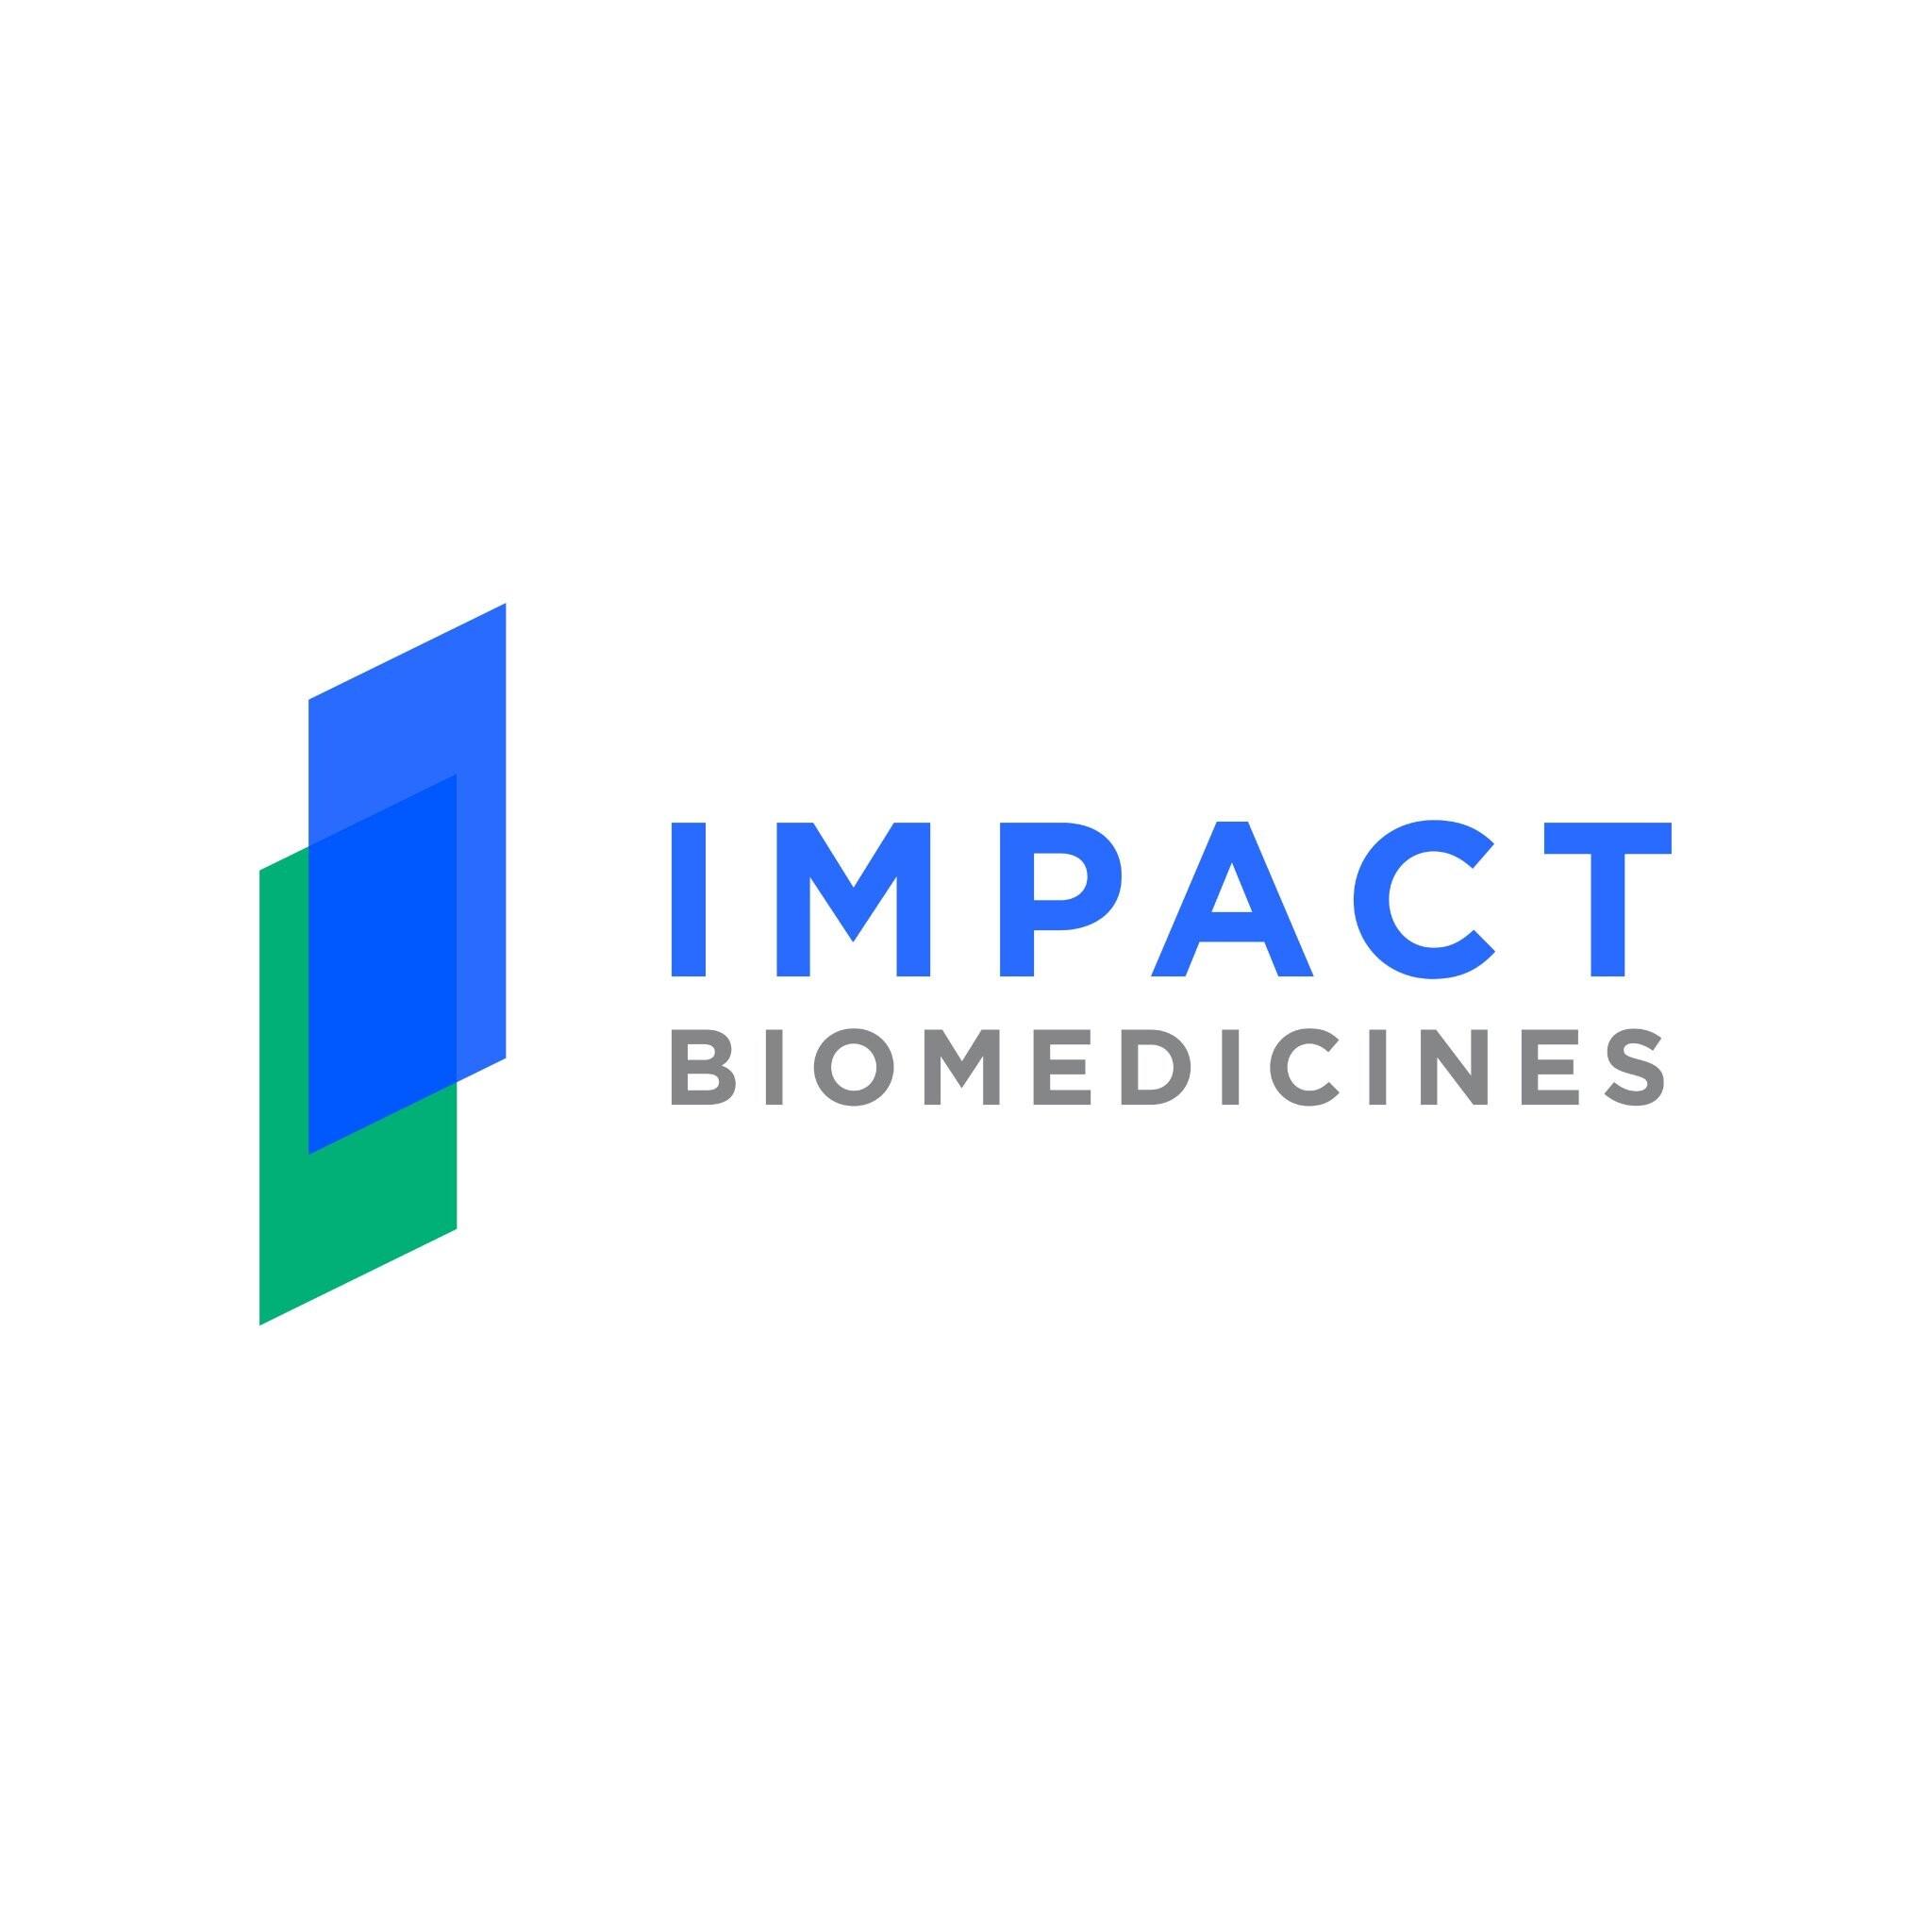 Impact Biomedicines